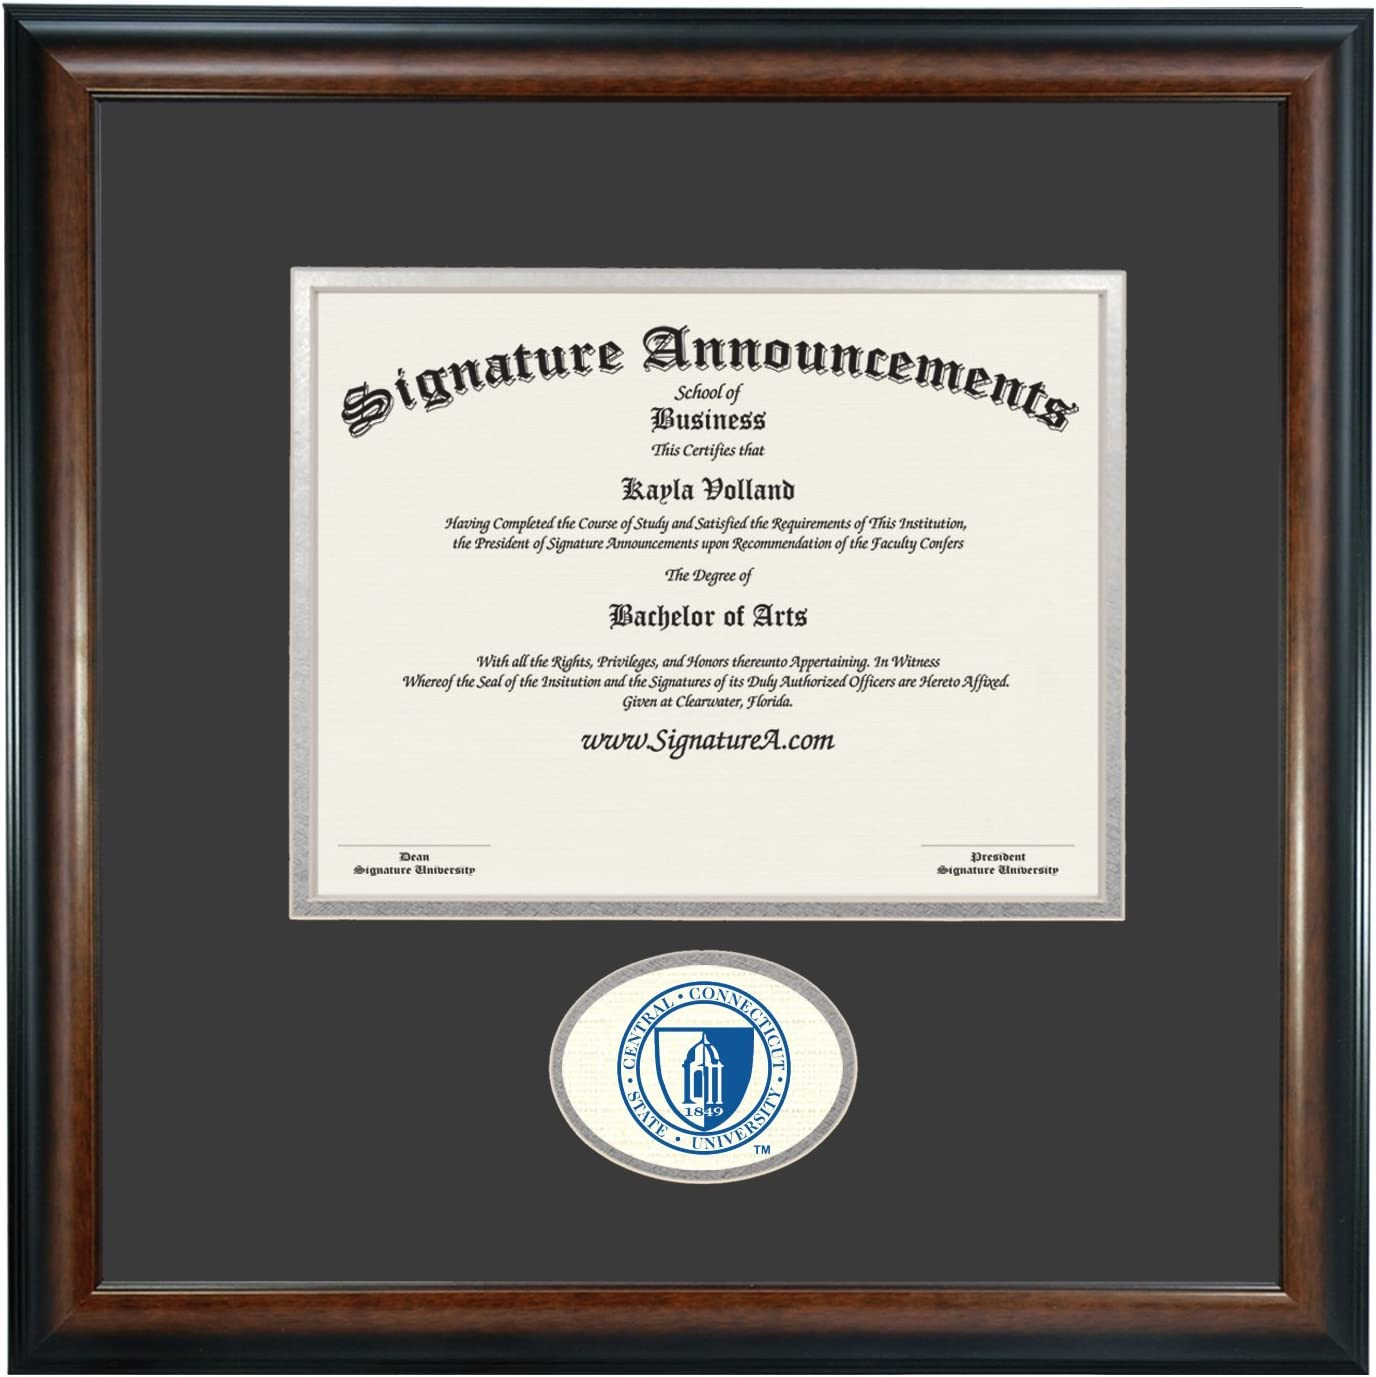 Signature Announcements Central Connecticut State University Undergraduate Sculpted Foil Seal Graduation Diploma Frame Matte Mahogany 16 x 16